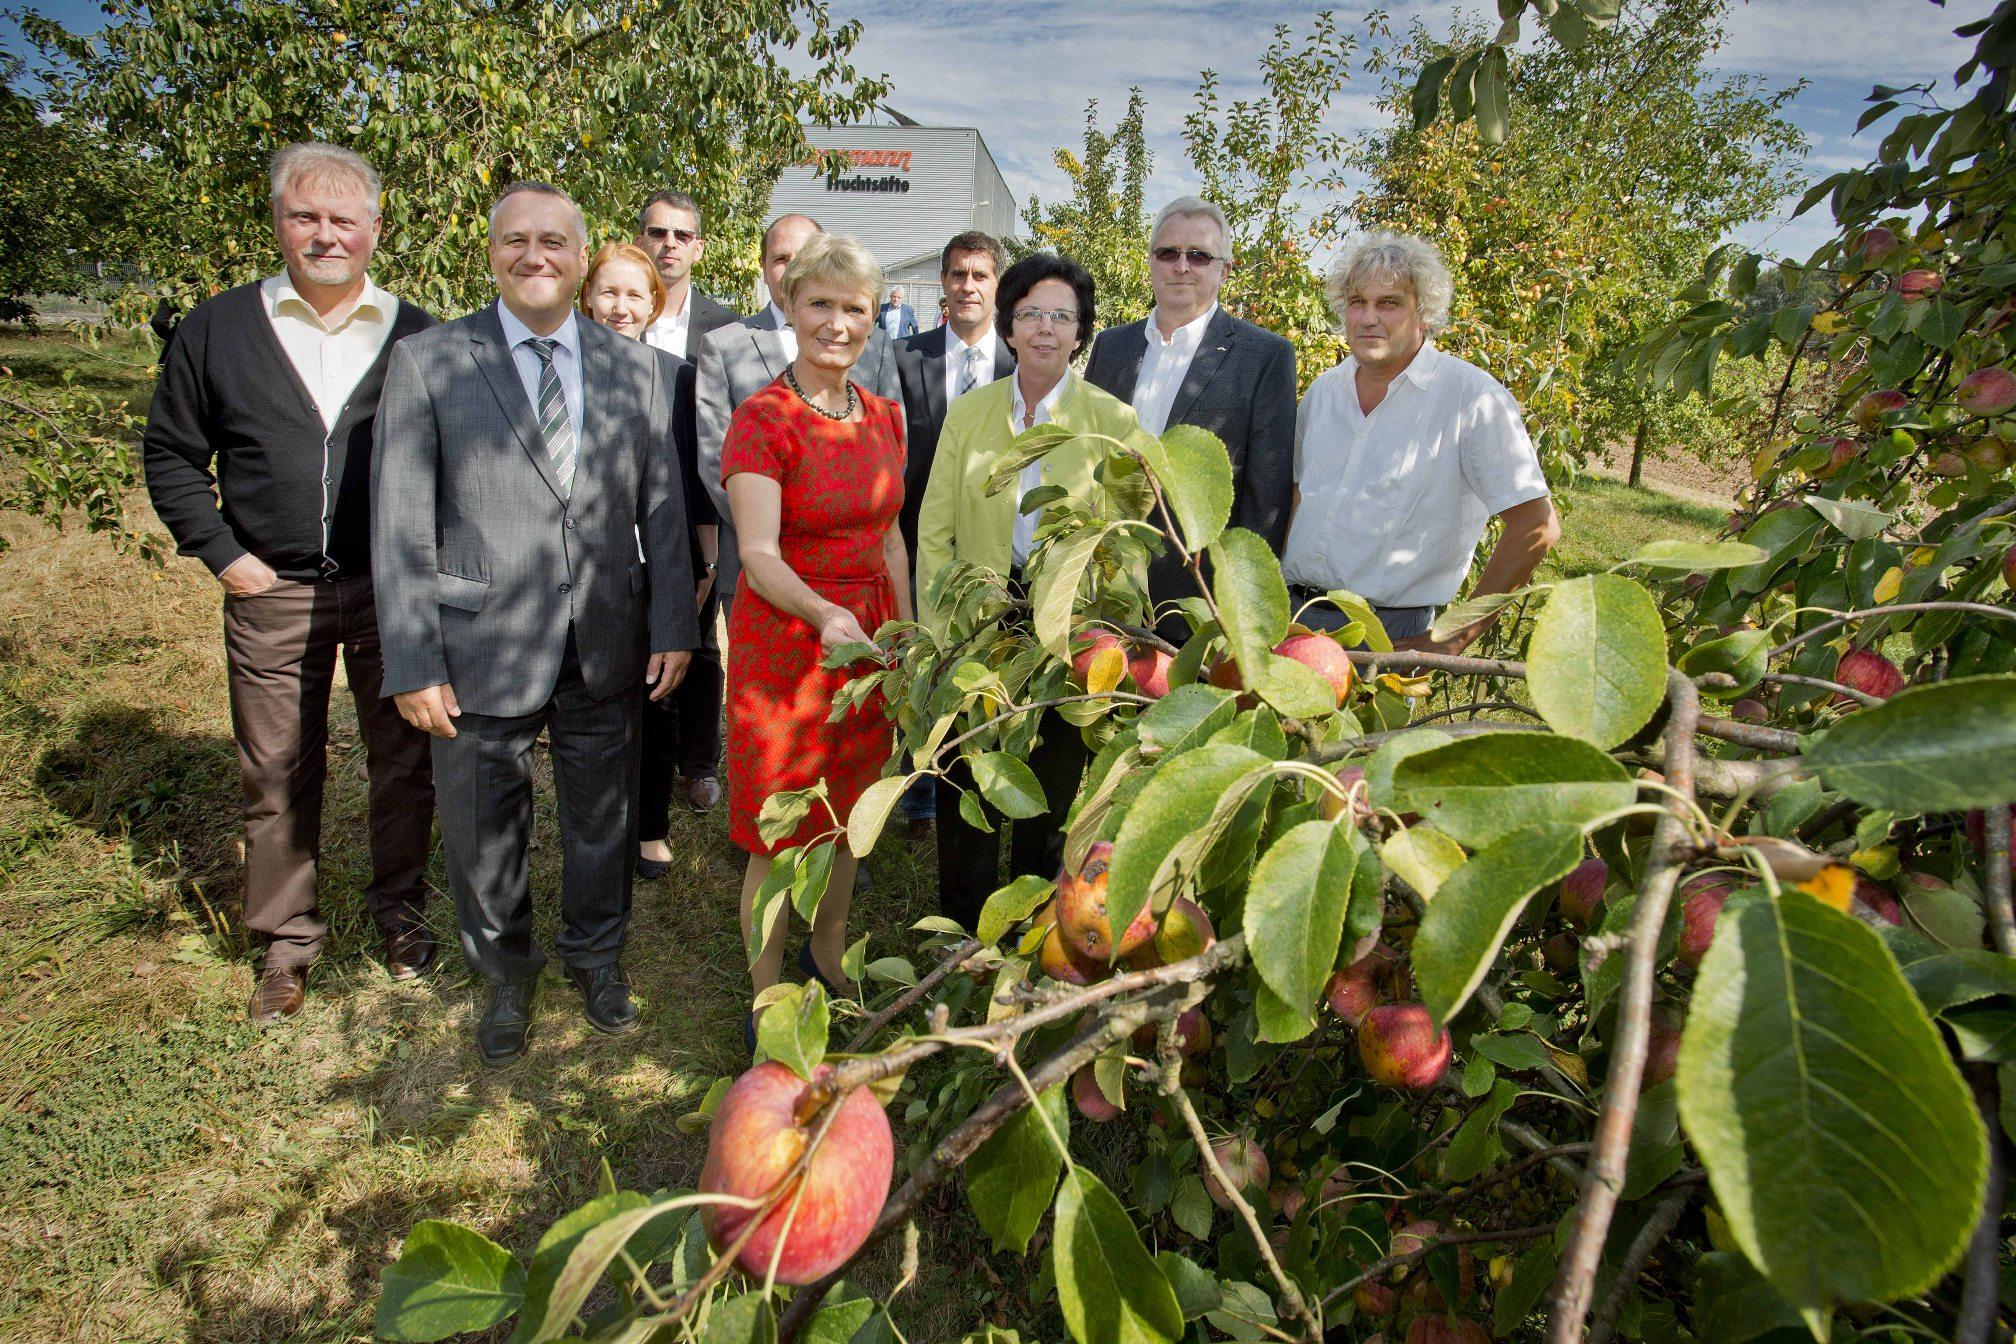 Bild Eröffnung der Apfelsaftsaison 2016